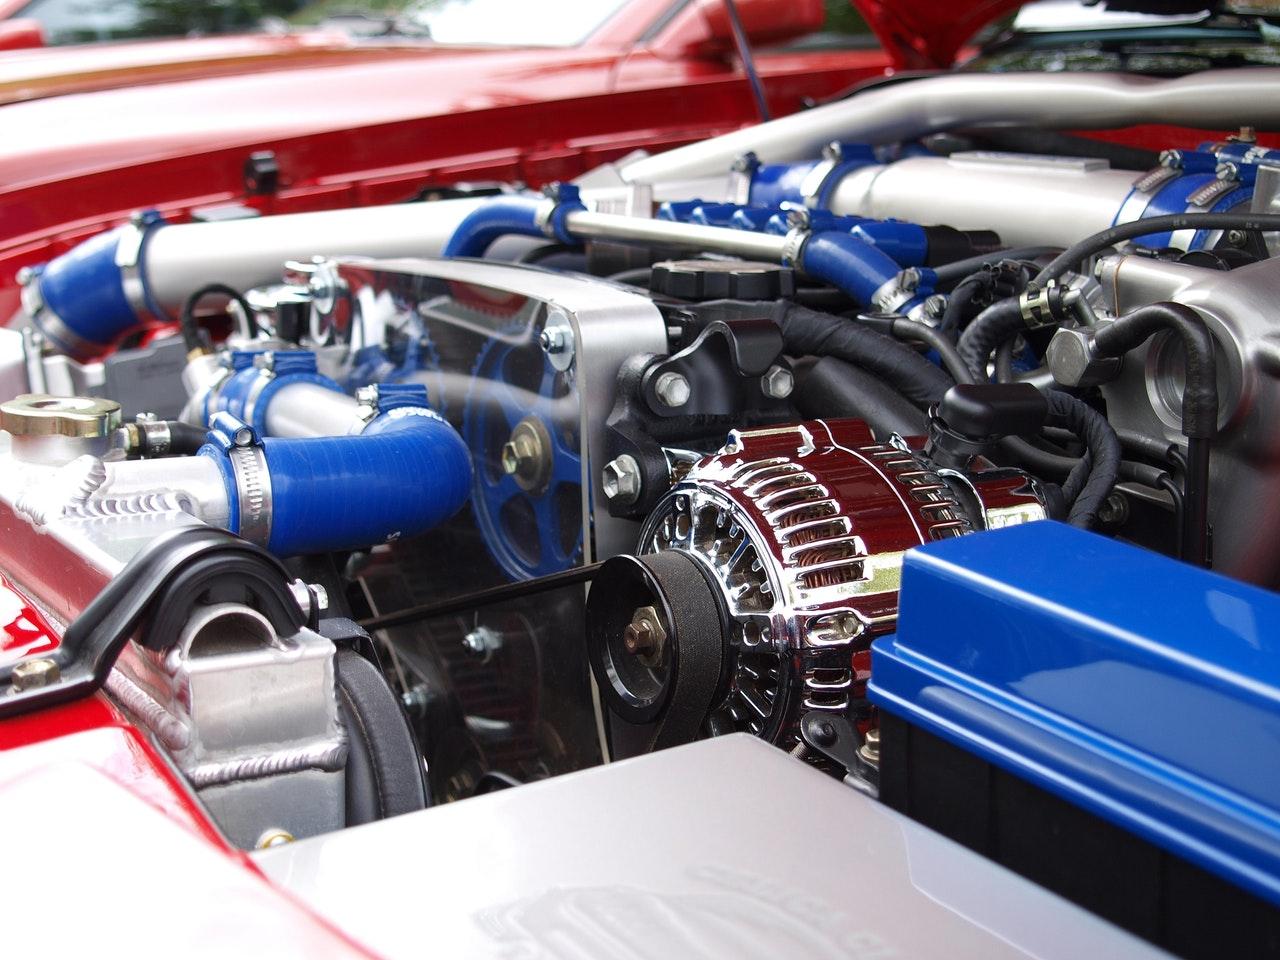 Best New Automotive Engineering Job Opportunities - Monday 11/09